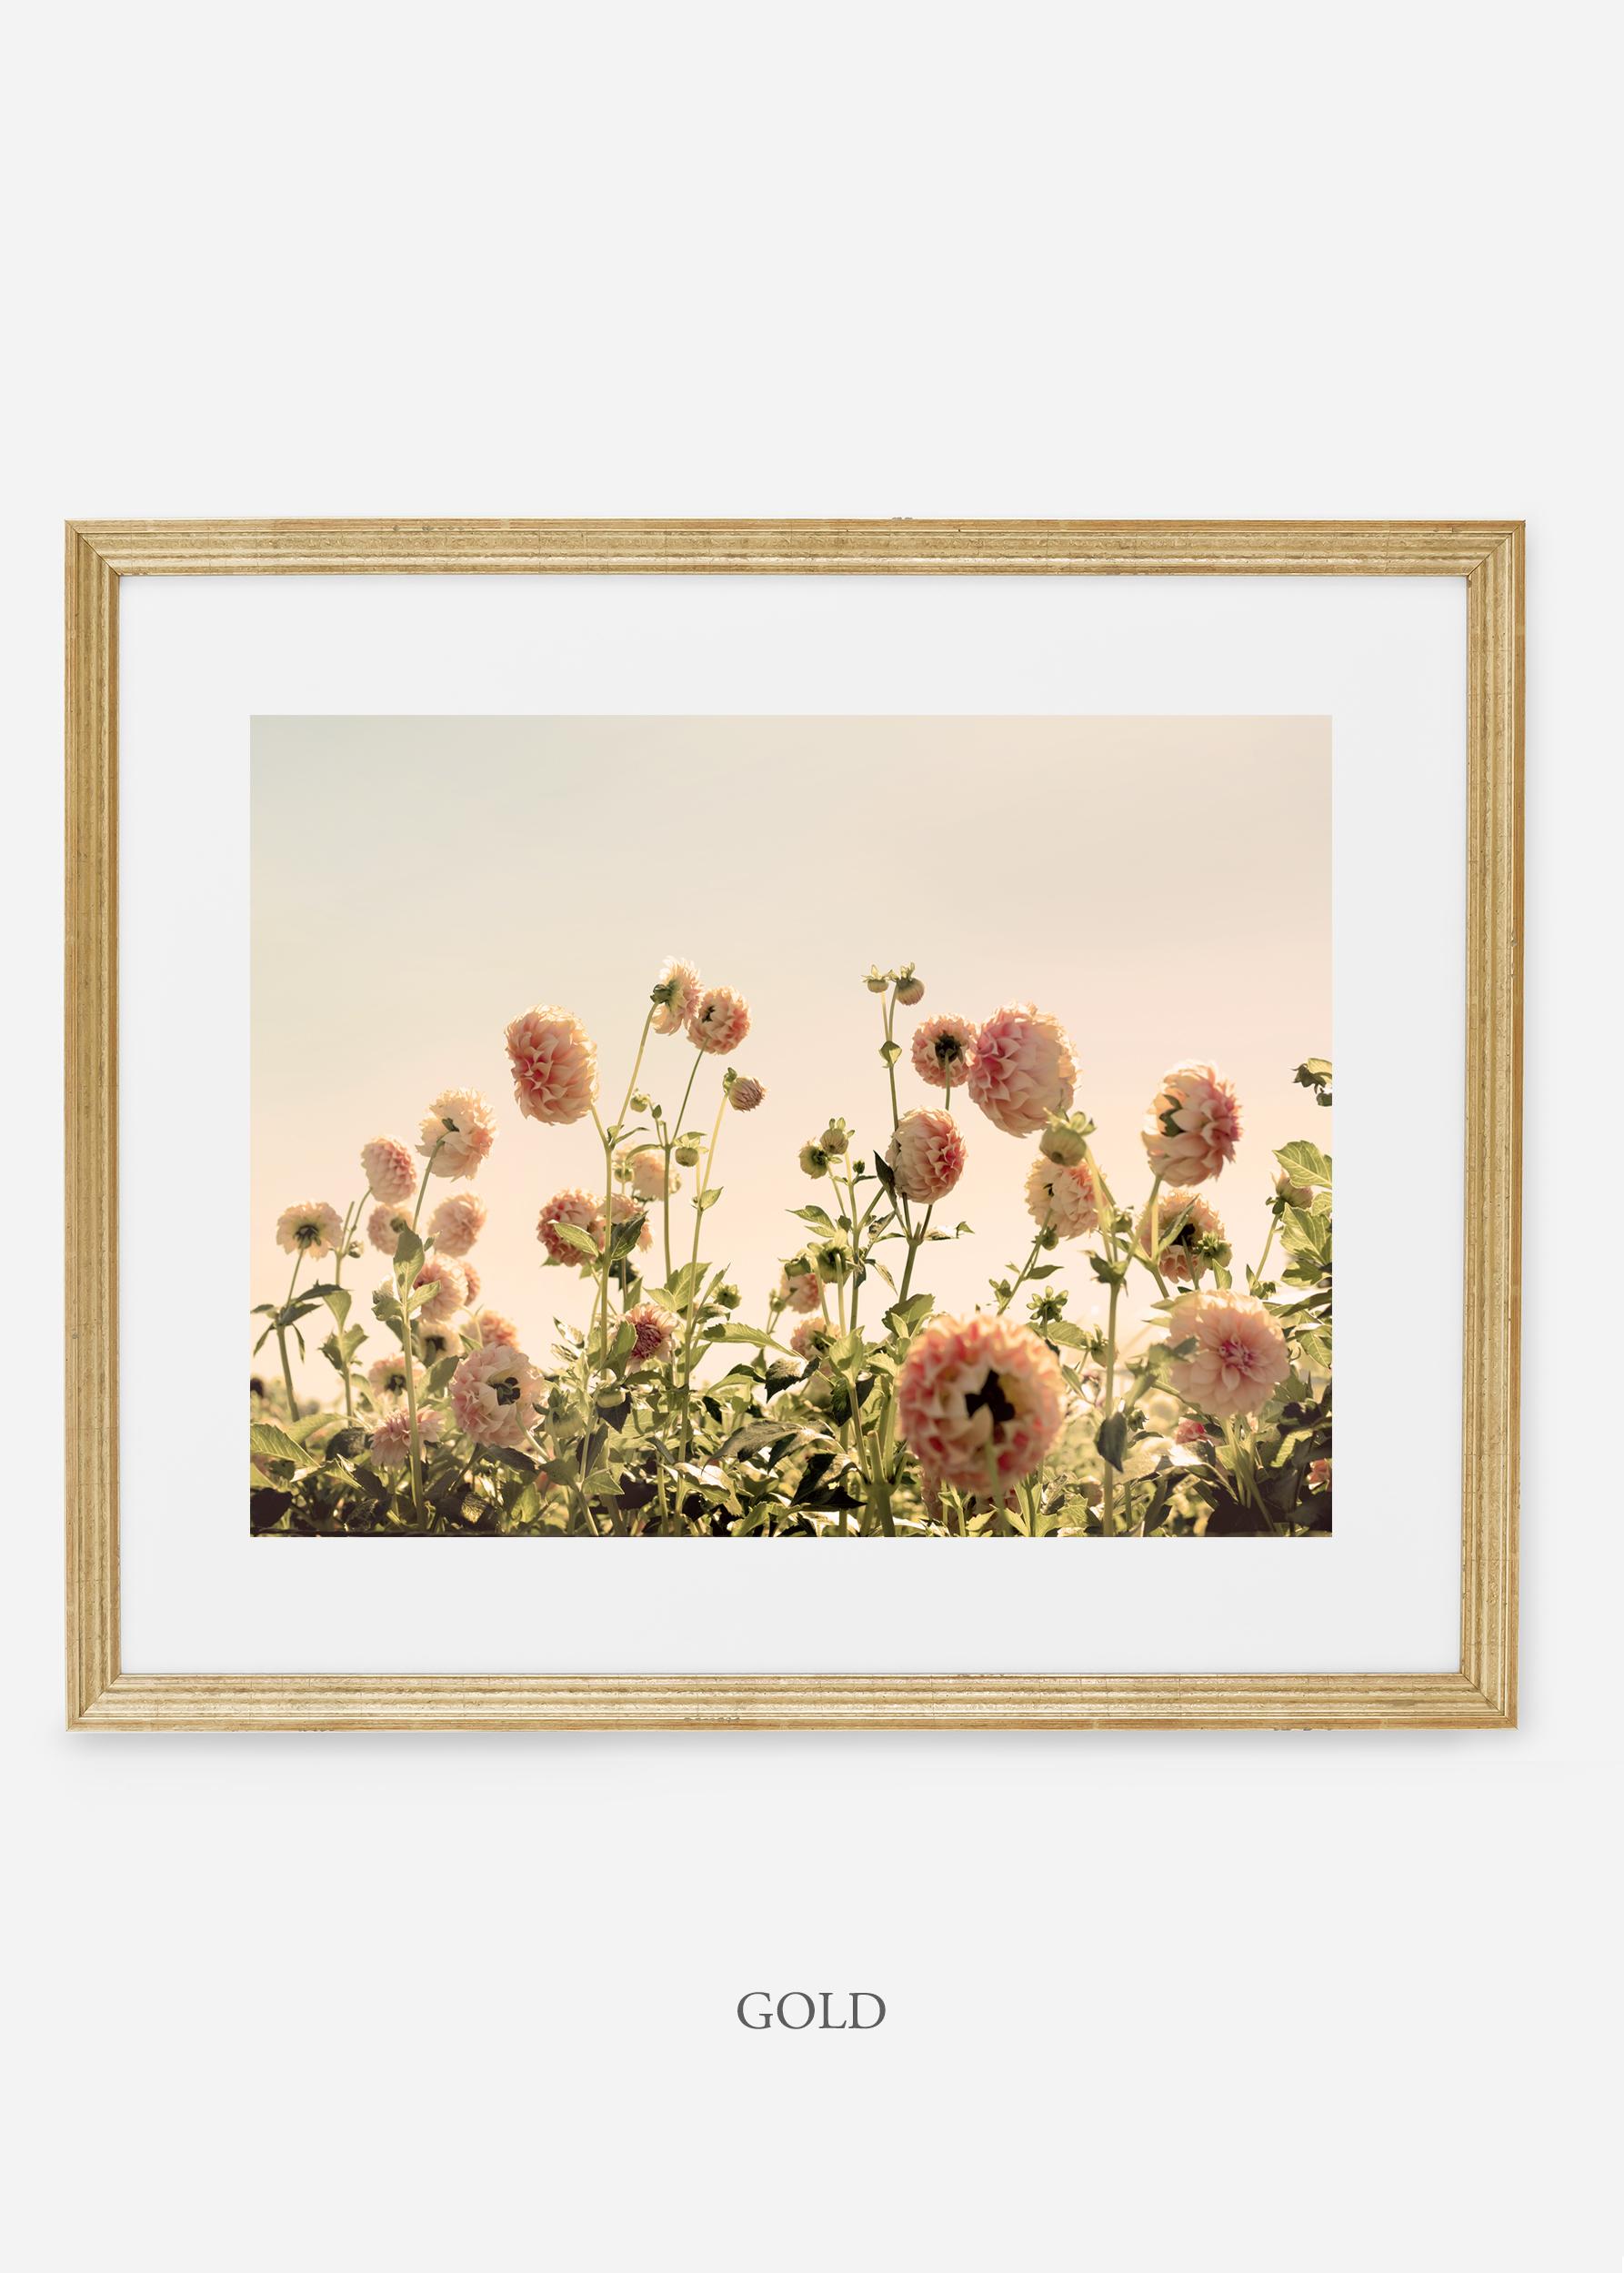 GoldFrame_DahliaNo.1_WilderCalifornia_Art_Floral_Homedecor_Prints_Dahlia_Botanical_Artwork_Interiordesign.jpg